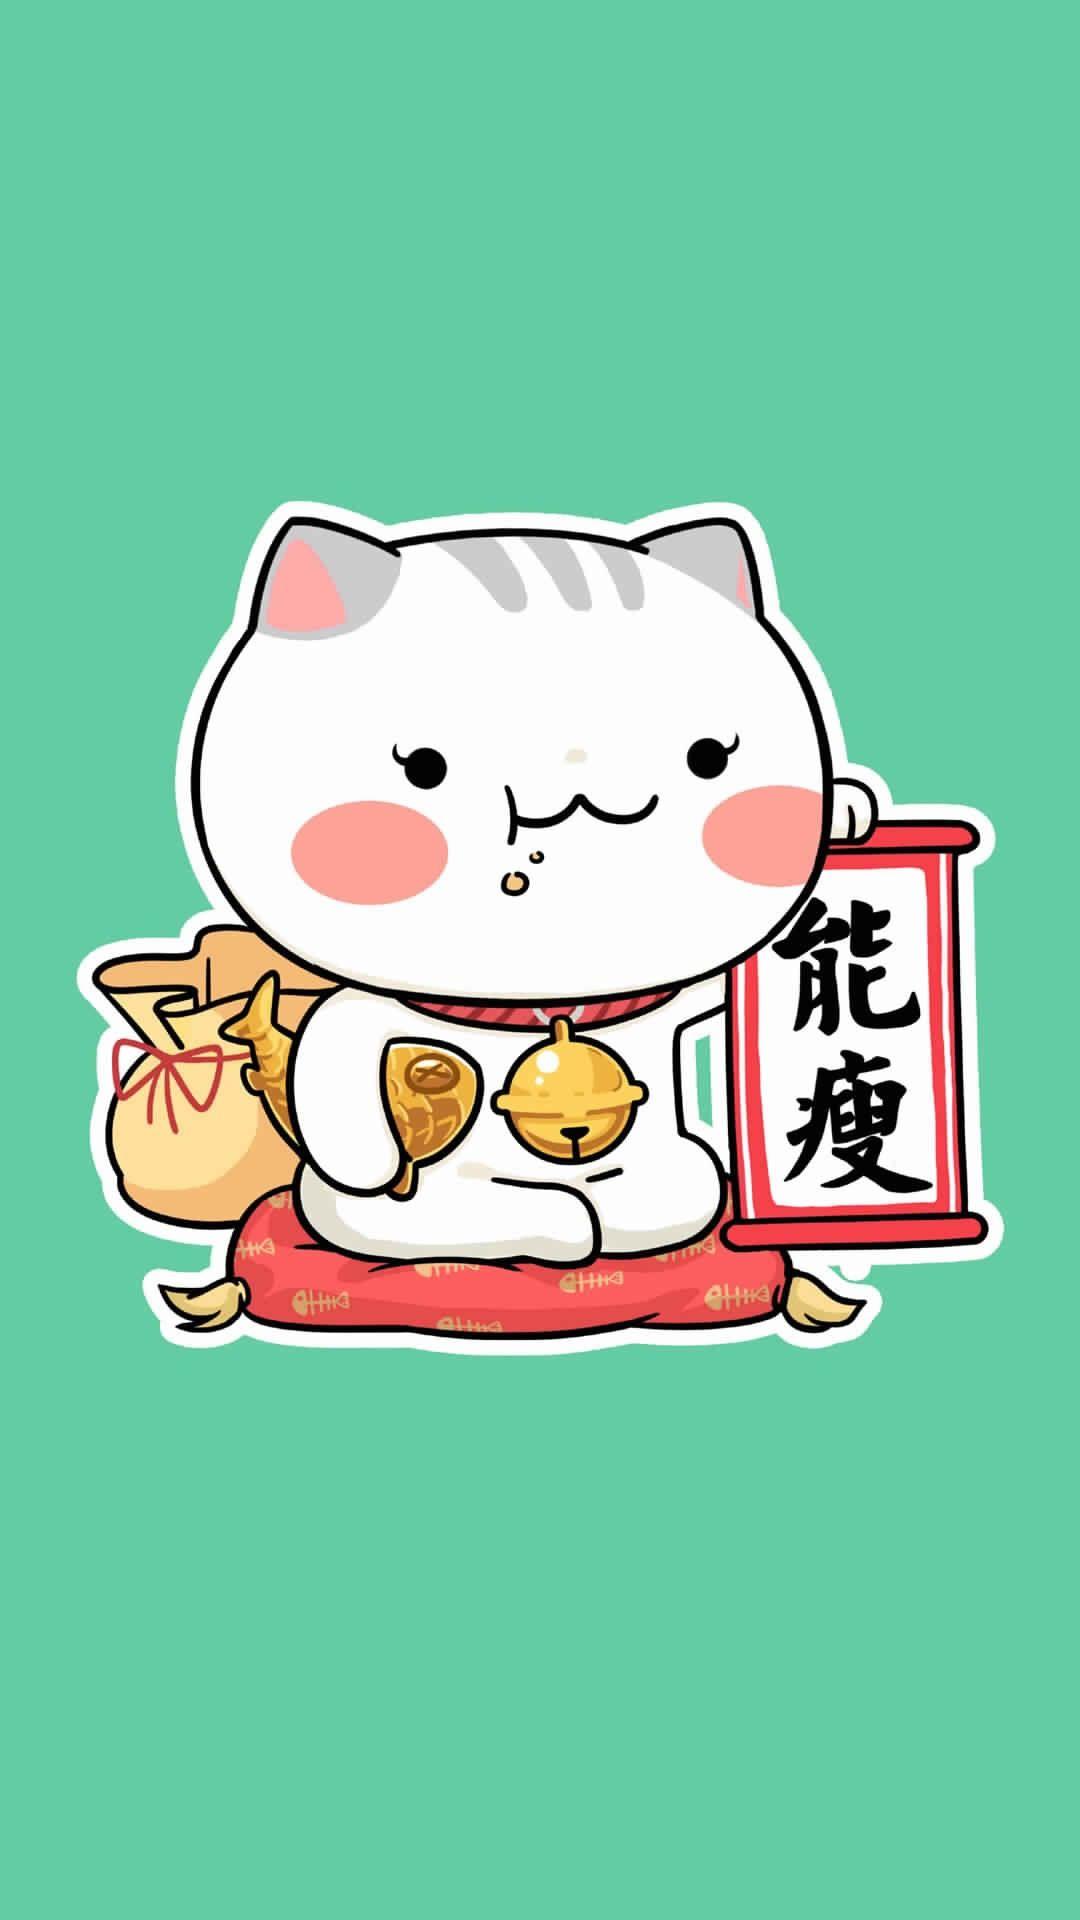 Pin By Hazel Yue On Iphone Wallpaper Wallpaper Iphone Cute Cute Art Kawaii Wallpaper